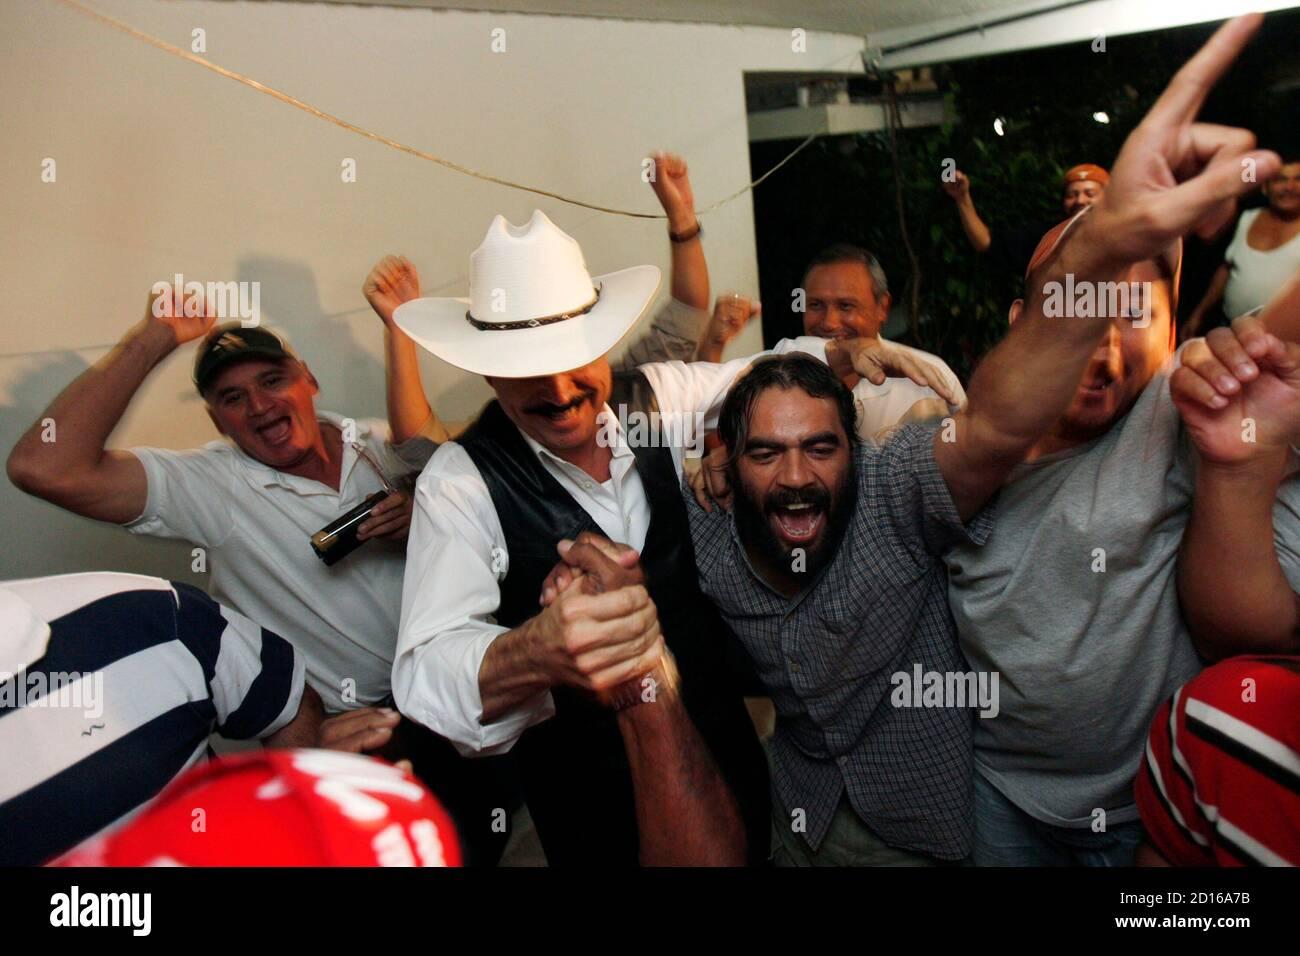 Ousted Honduras' President Manuel Zelaya (C) celebrates with supporters after Honduras' 2010 World Cup qualifying match victory over El Salvador, inside the Brazilian embassy in Tegucigalpa October 14, 2009. REUTERS/Edgard Garrido (HONDURAS POLITICS SPORT) Banque D'Images